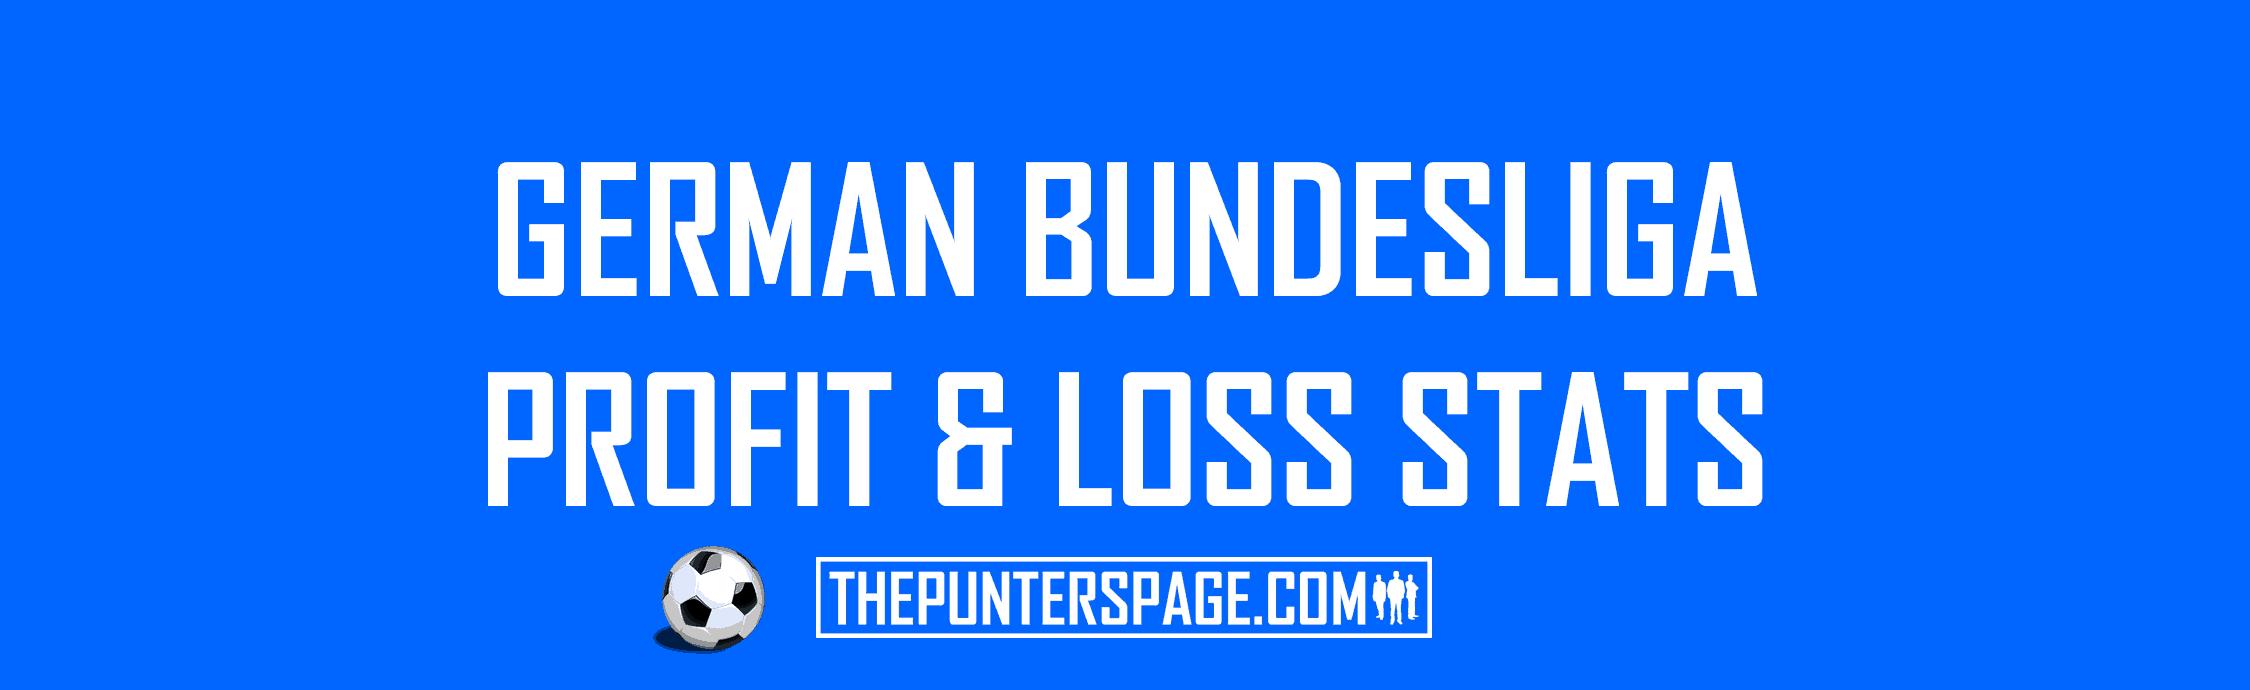 German Bundesliga Profit & Loss Statistics